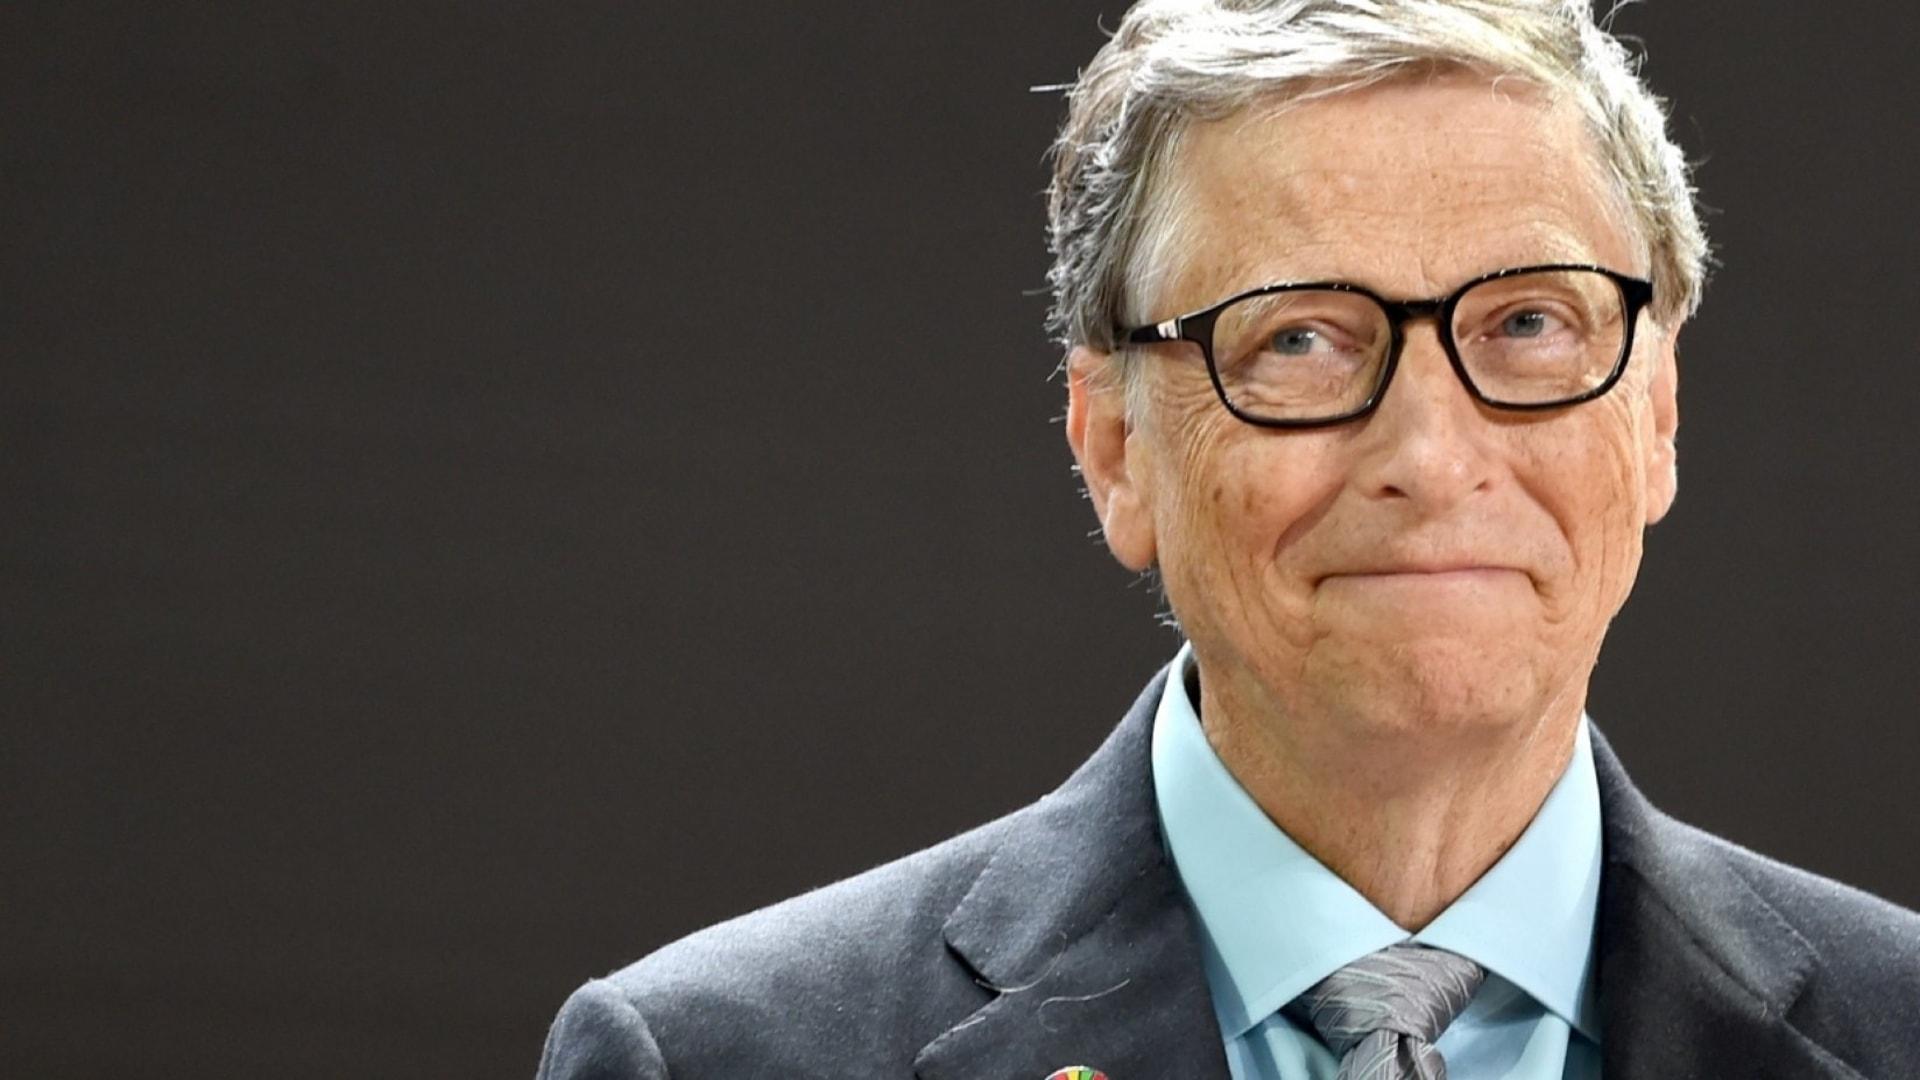 Microsoft co-founder Bill Gates.